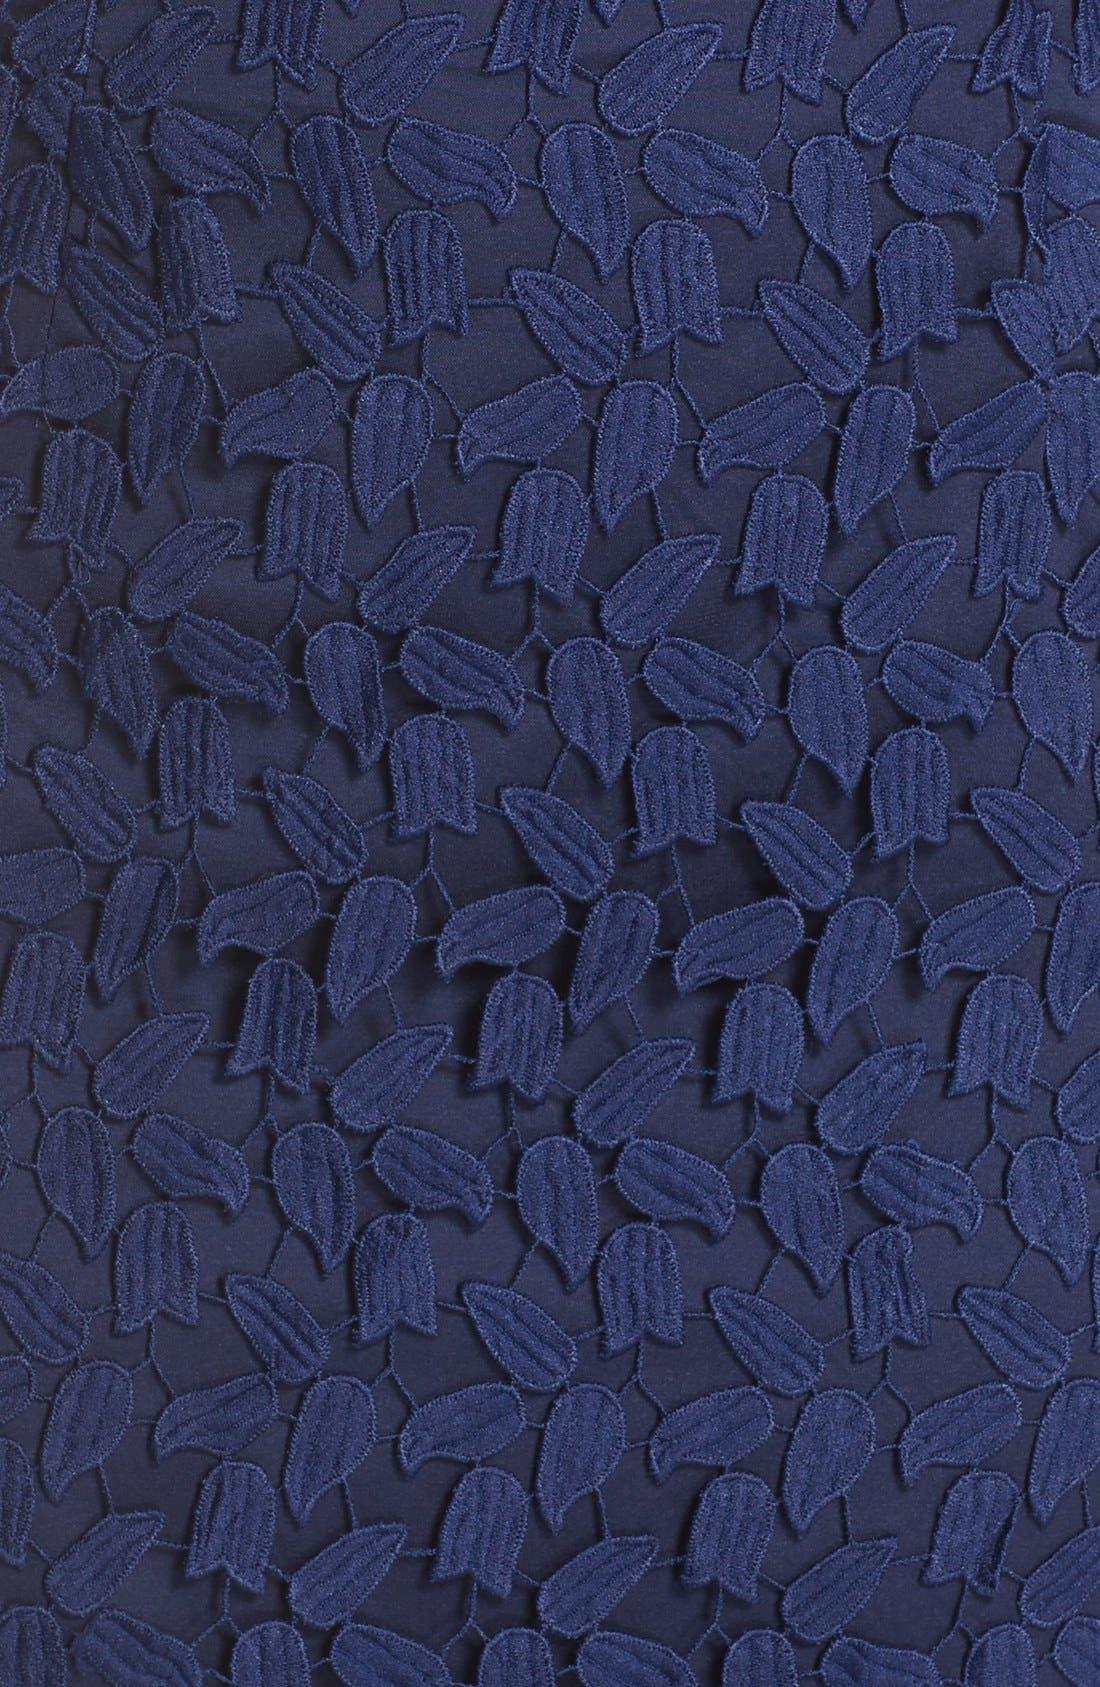 Gemma Halter Lace Sheath Dress,                             Alternate thumbnail 5, color,                             Blue Ink